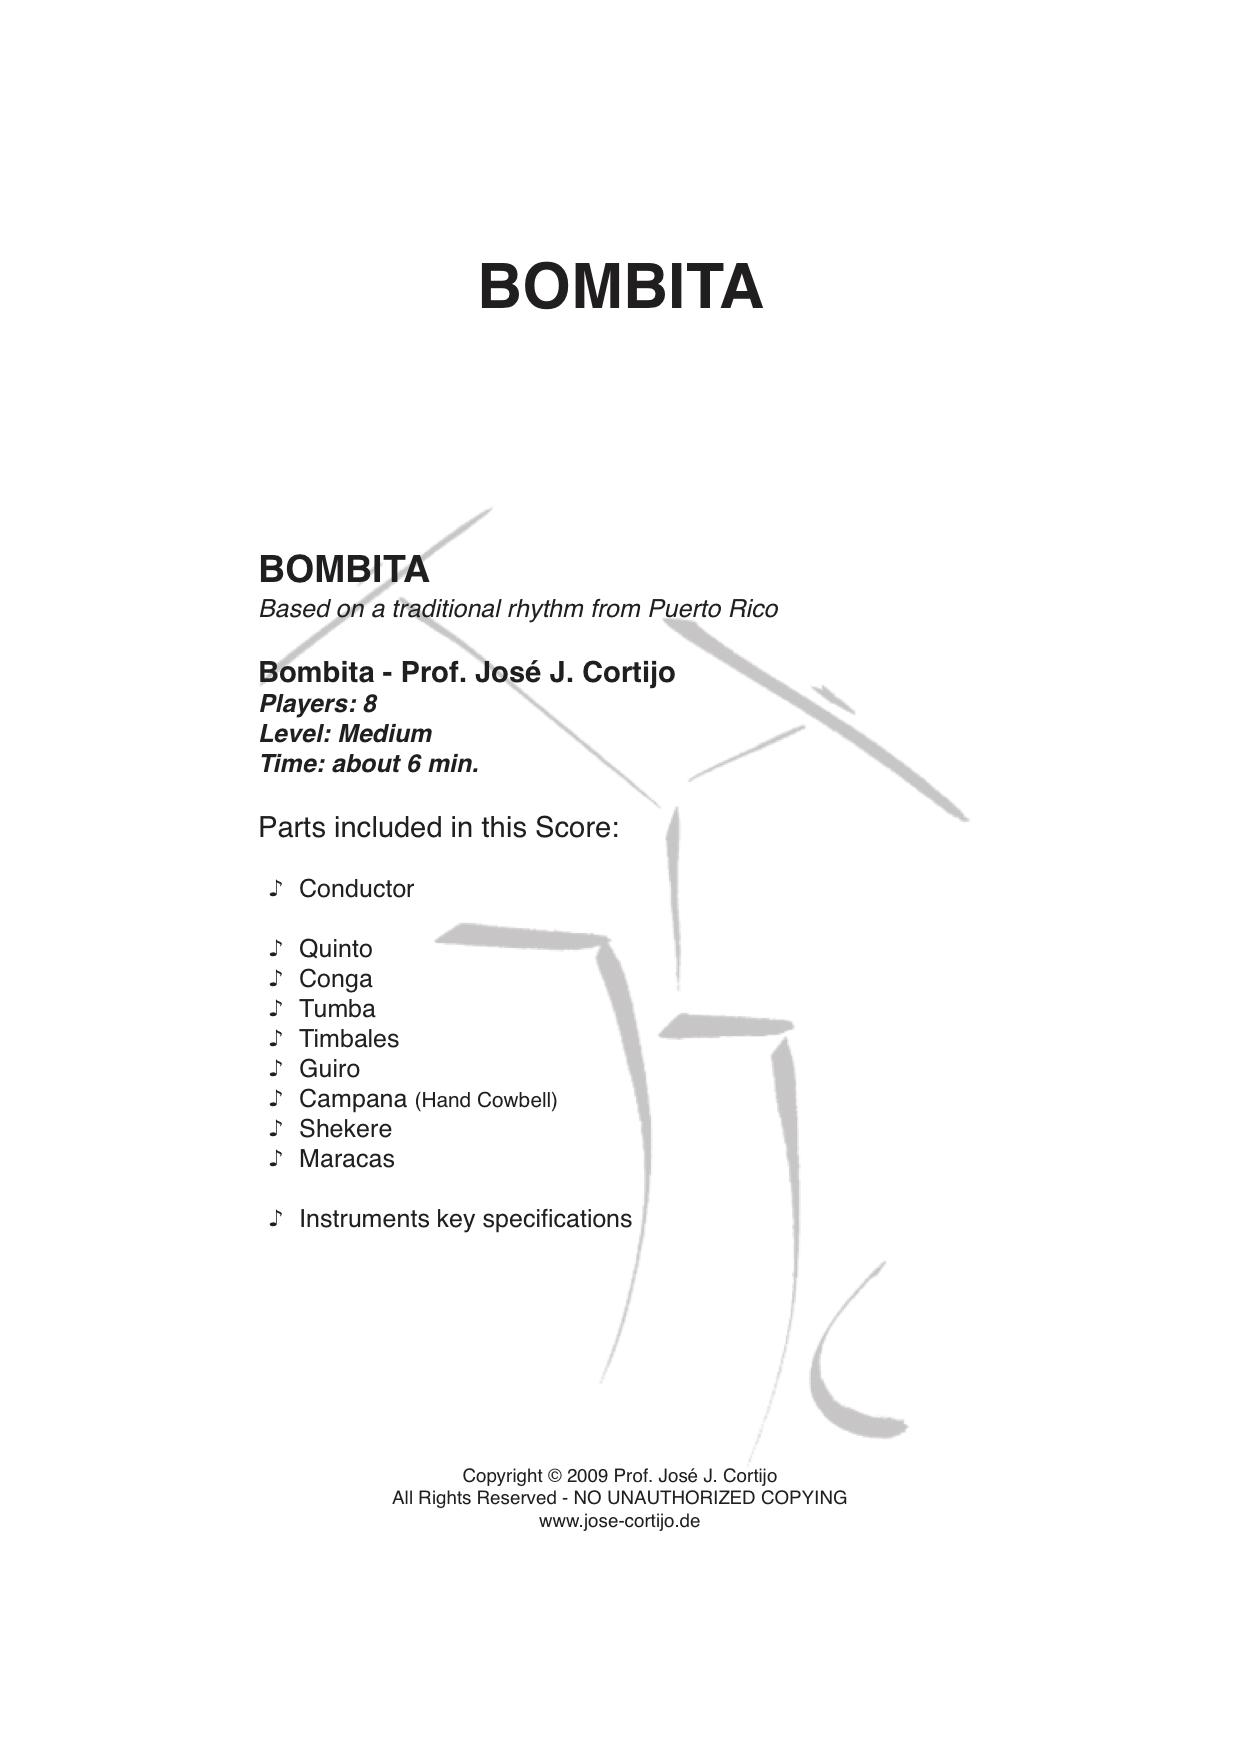 Bombita